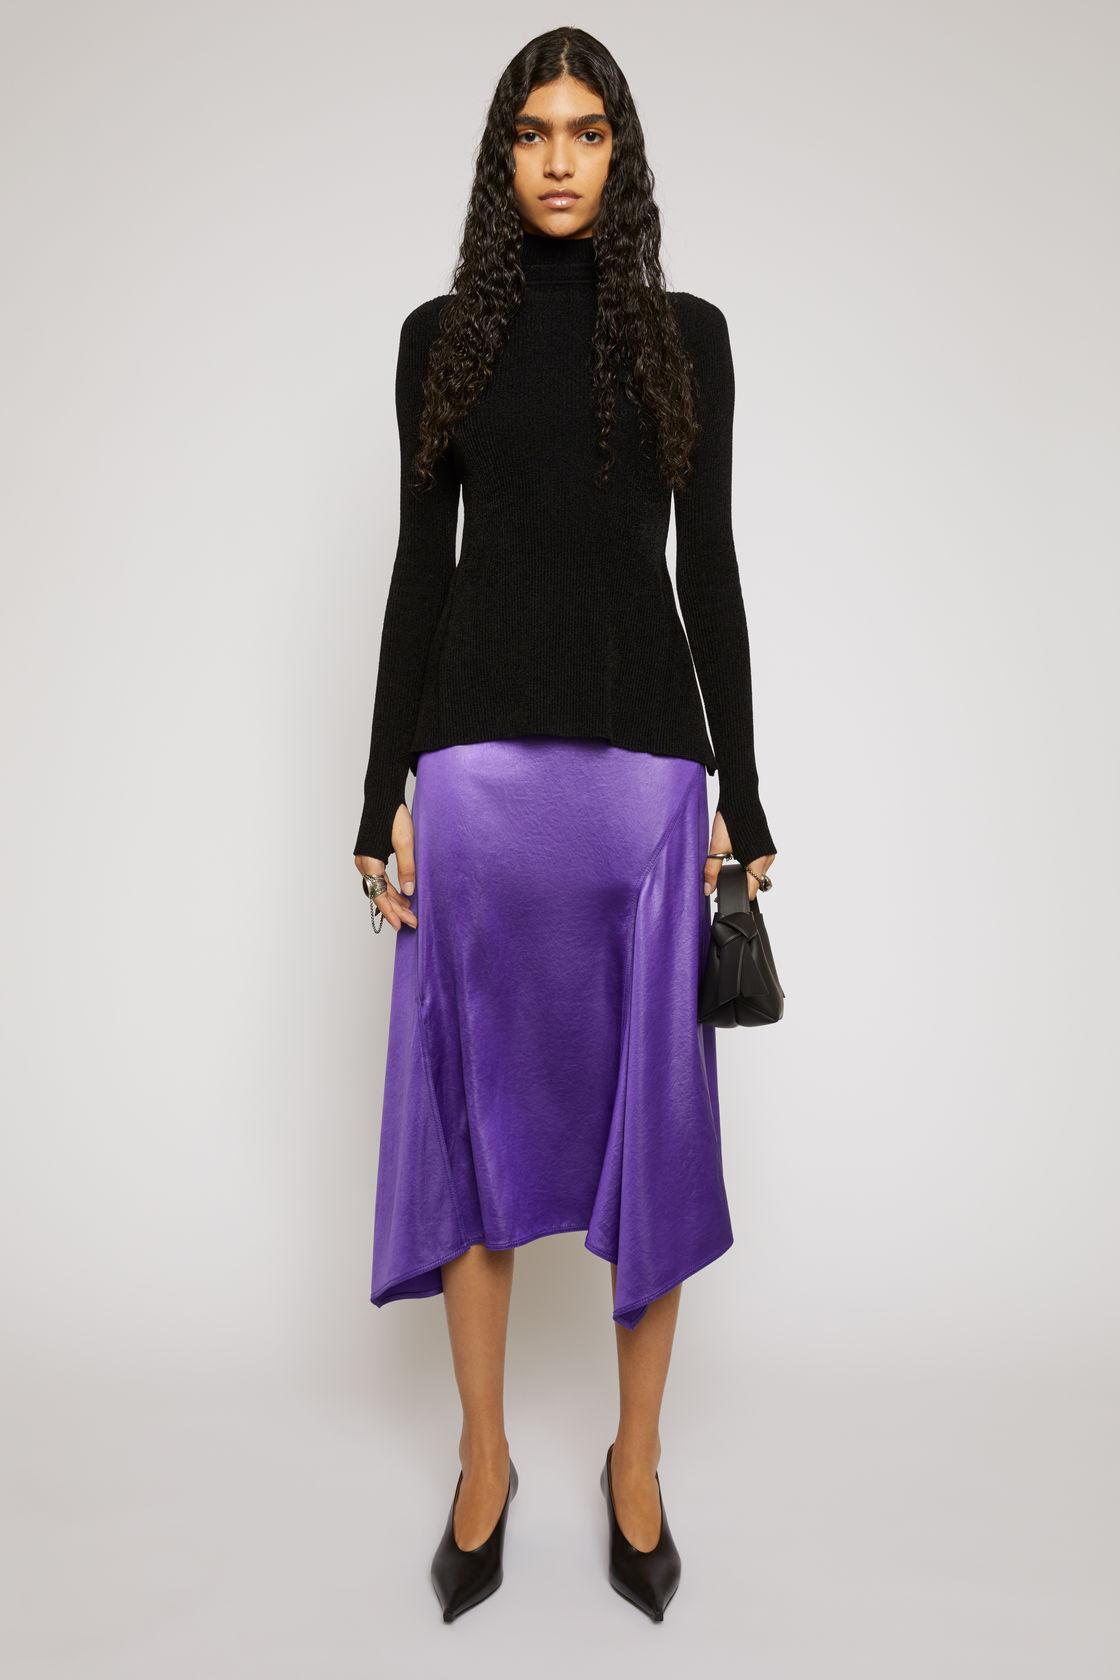 Bias-cut satin skirt electric purple, за 785лв.